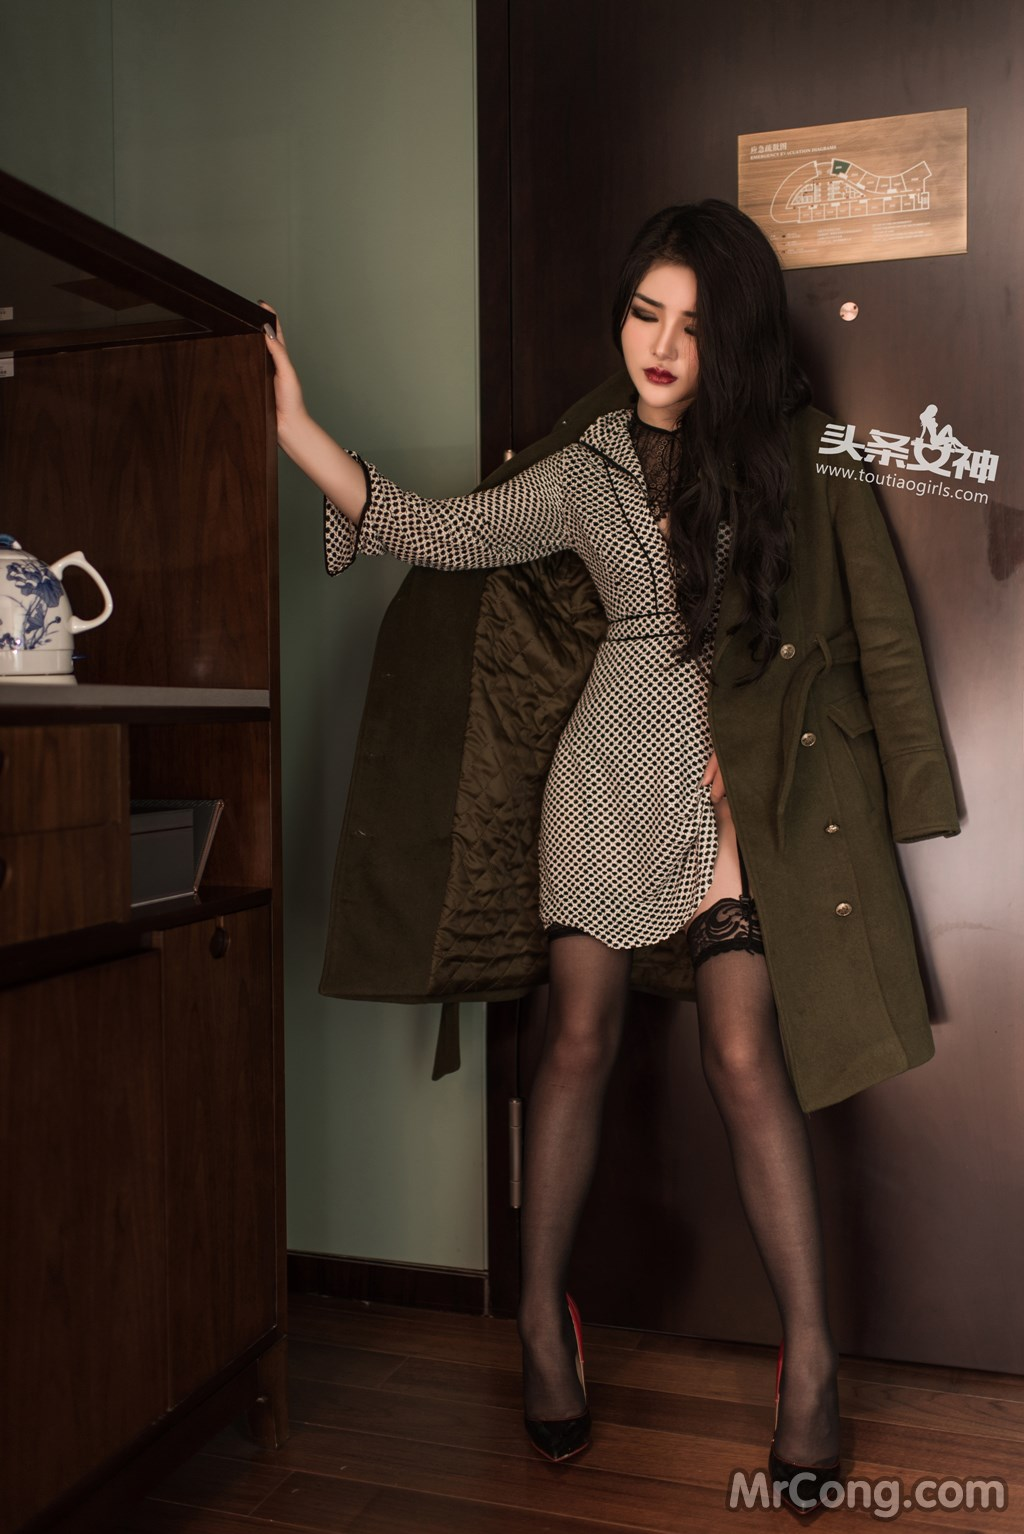 TouTiao 2017-02-15: Model Chen Yu Xi (陈宇曦) (30 photos)